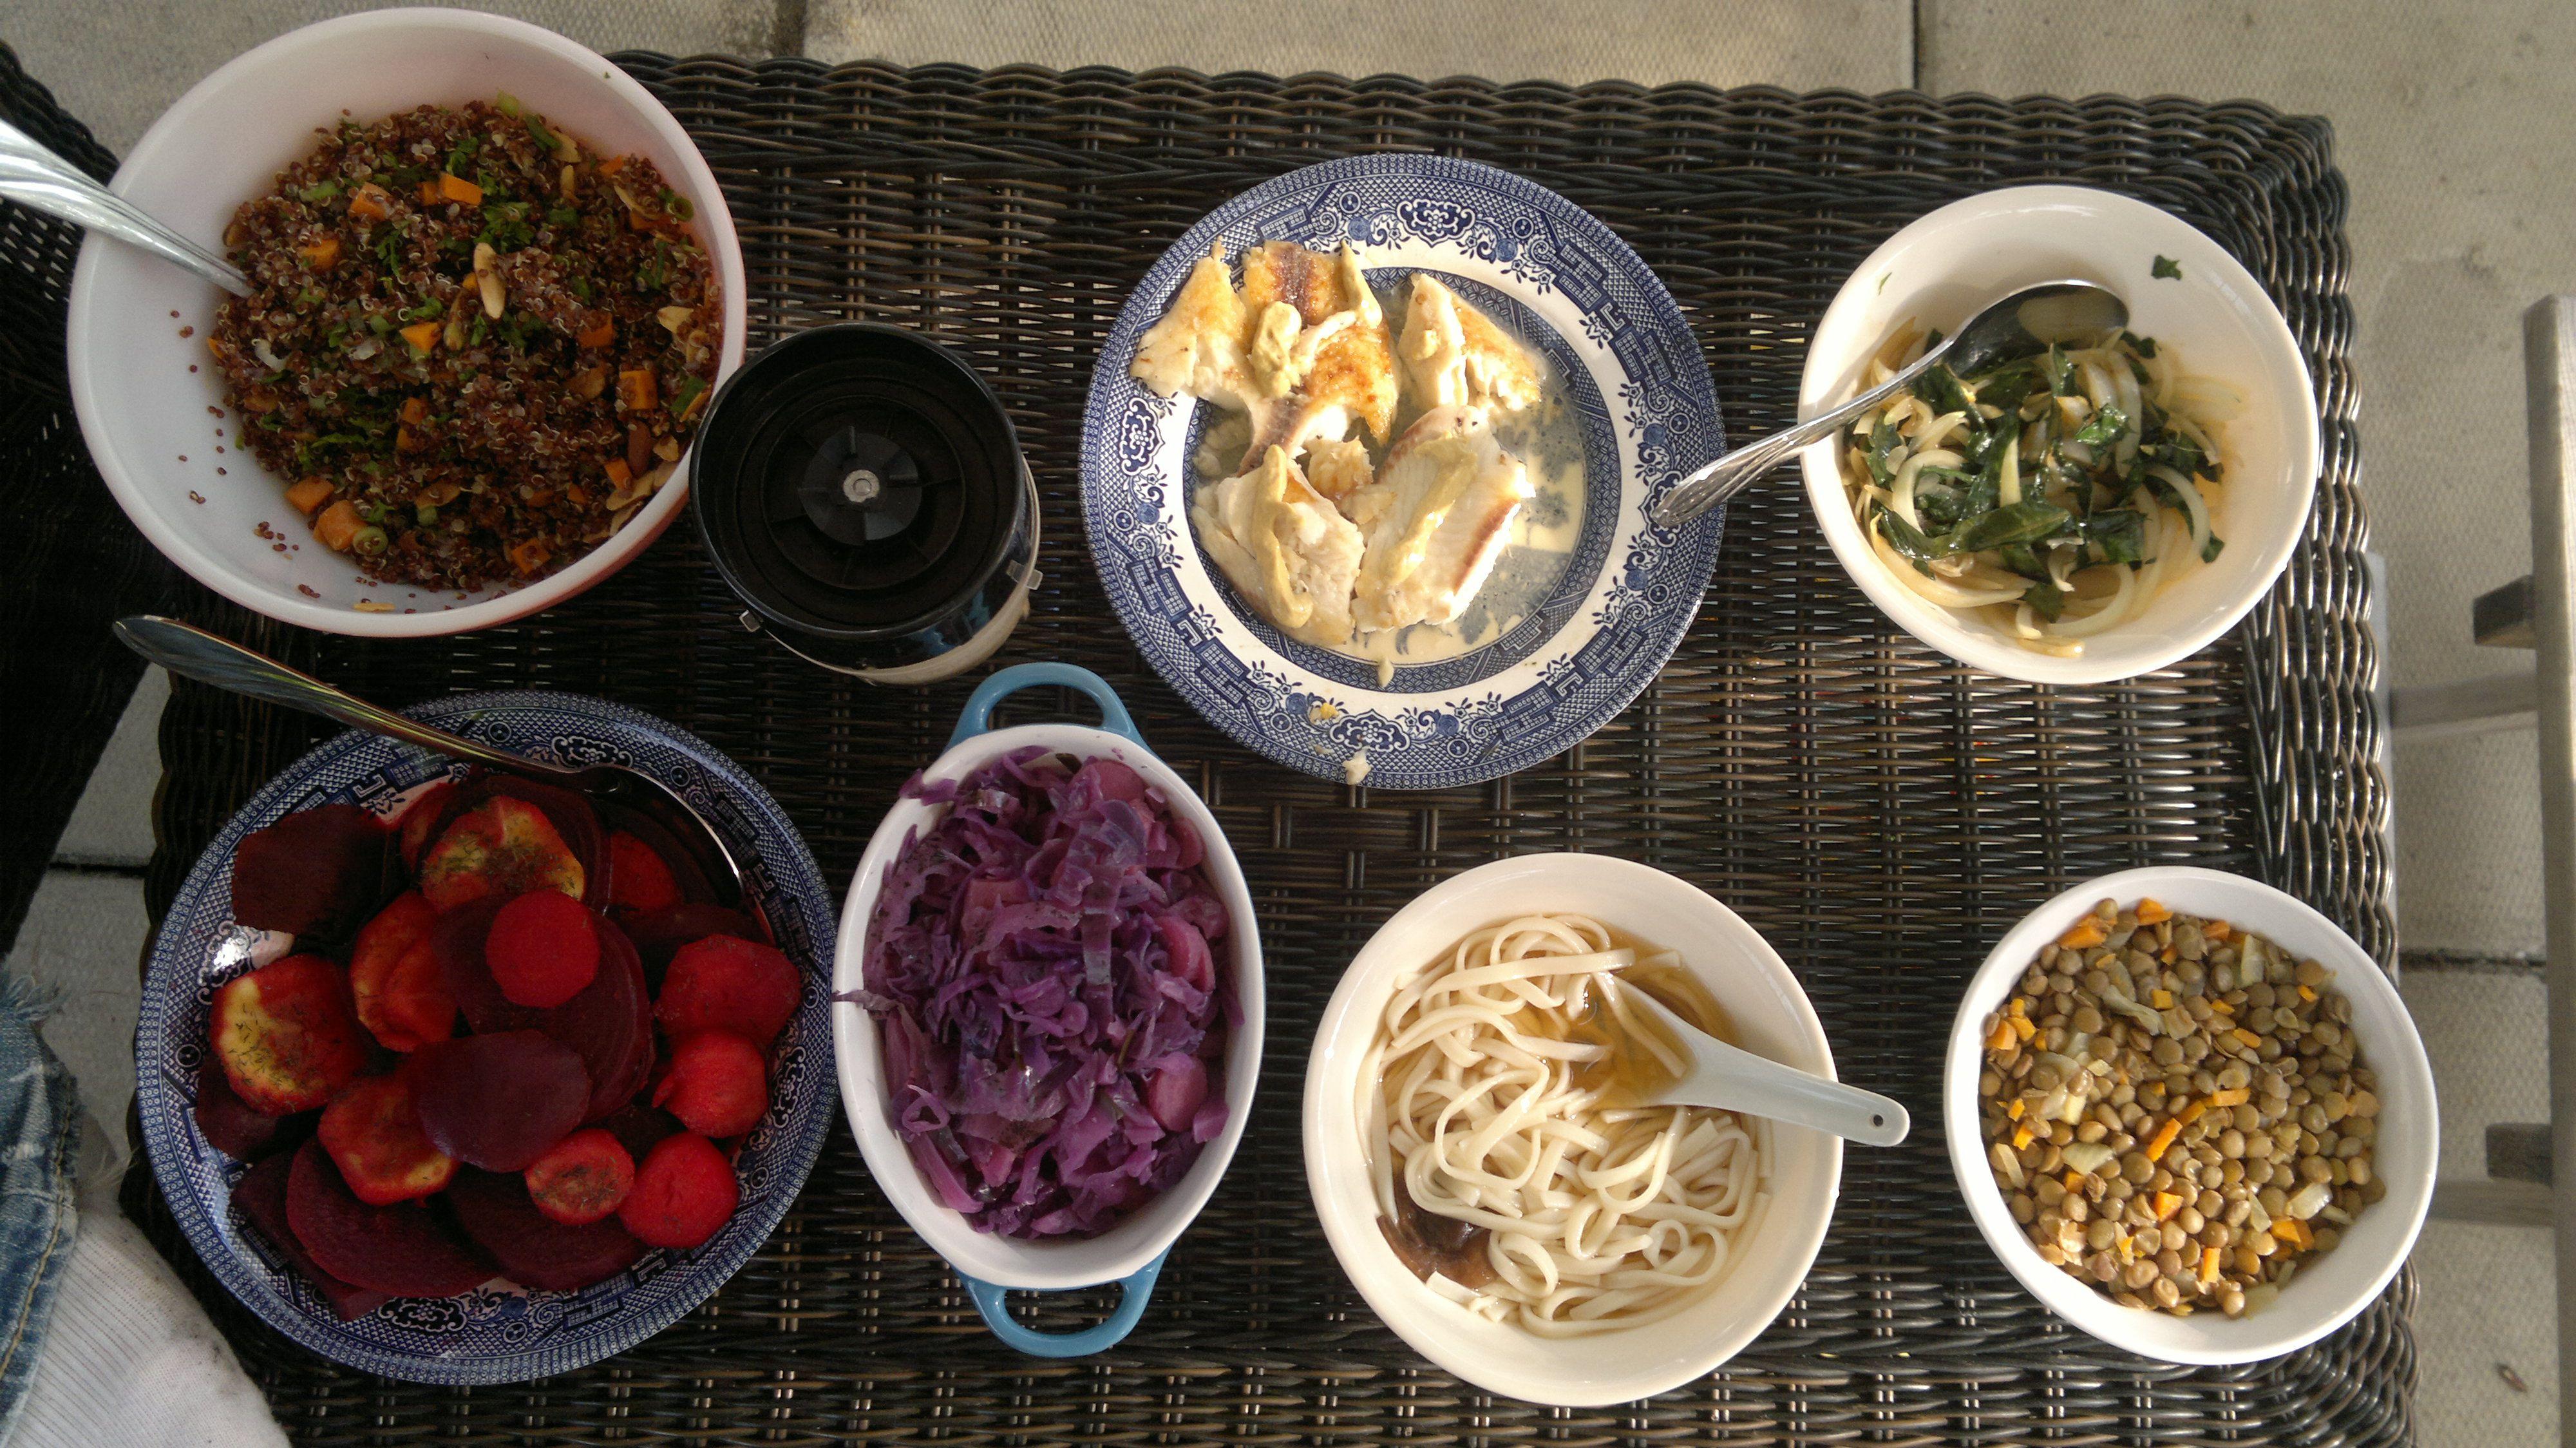 quinoa salad w/ tahini dressing, fish, sauteed onion + dandelion greens, chickpeas, udon noodles w/ broth, purple cabbage salad, and turnip + beet w/ dill